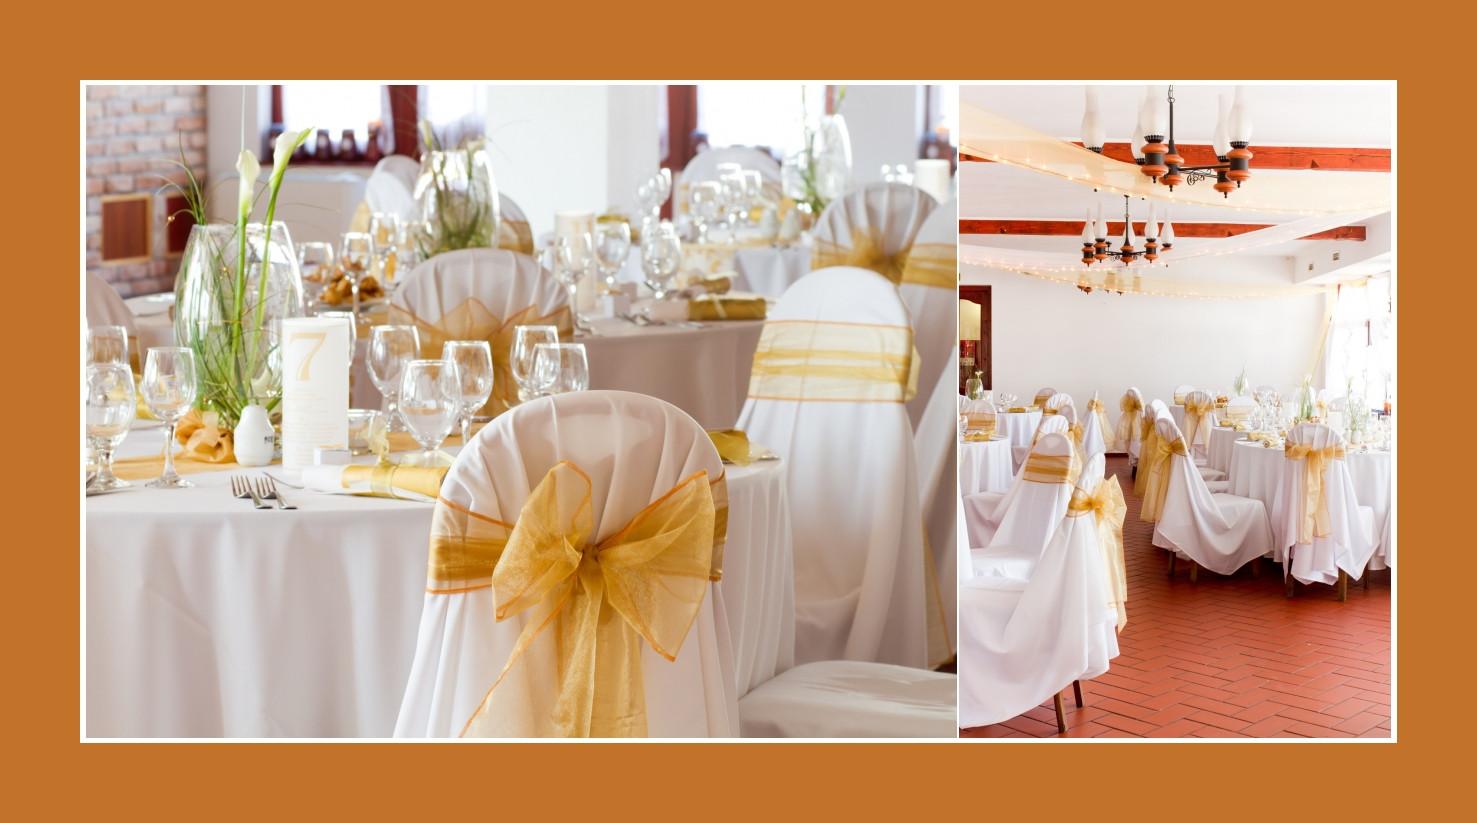 Deko Goldene Hochzeit  Tischdeko Hochzeitsdeko